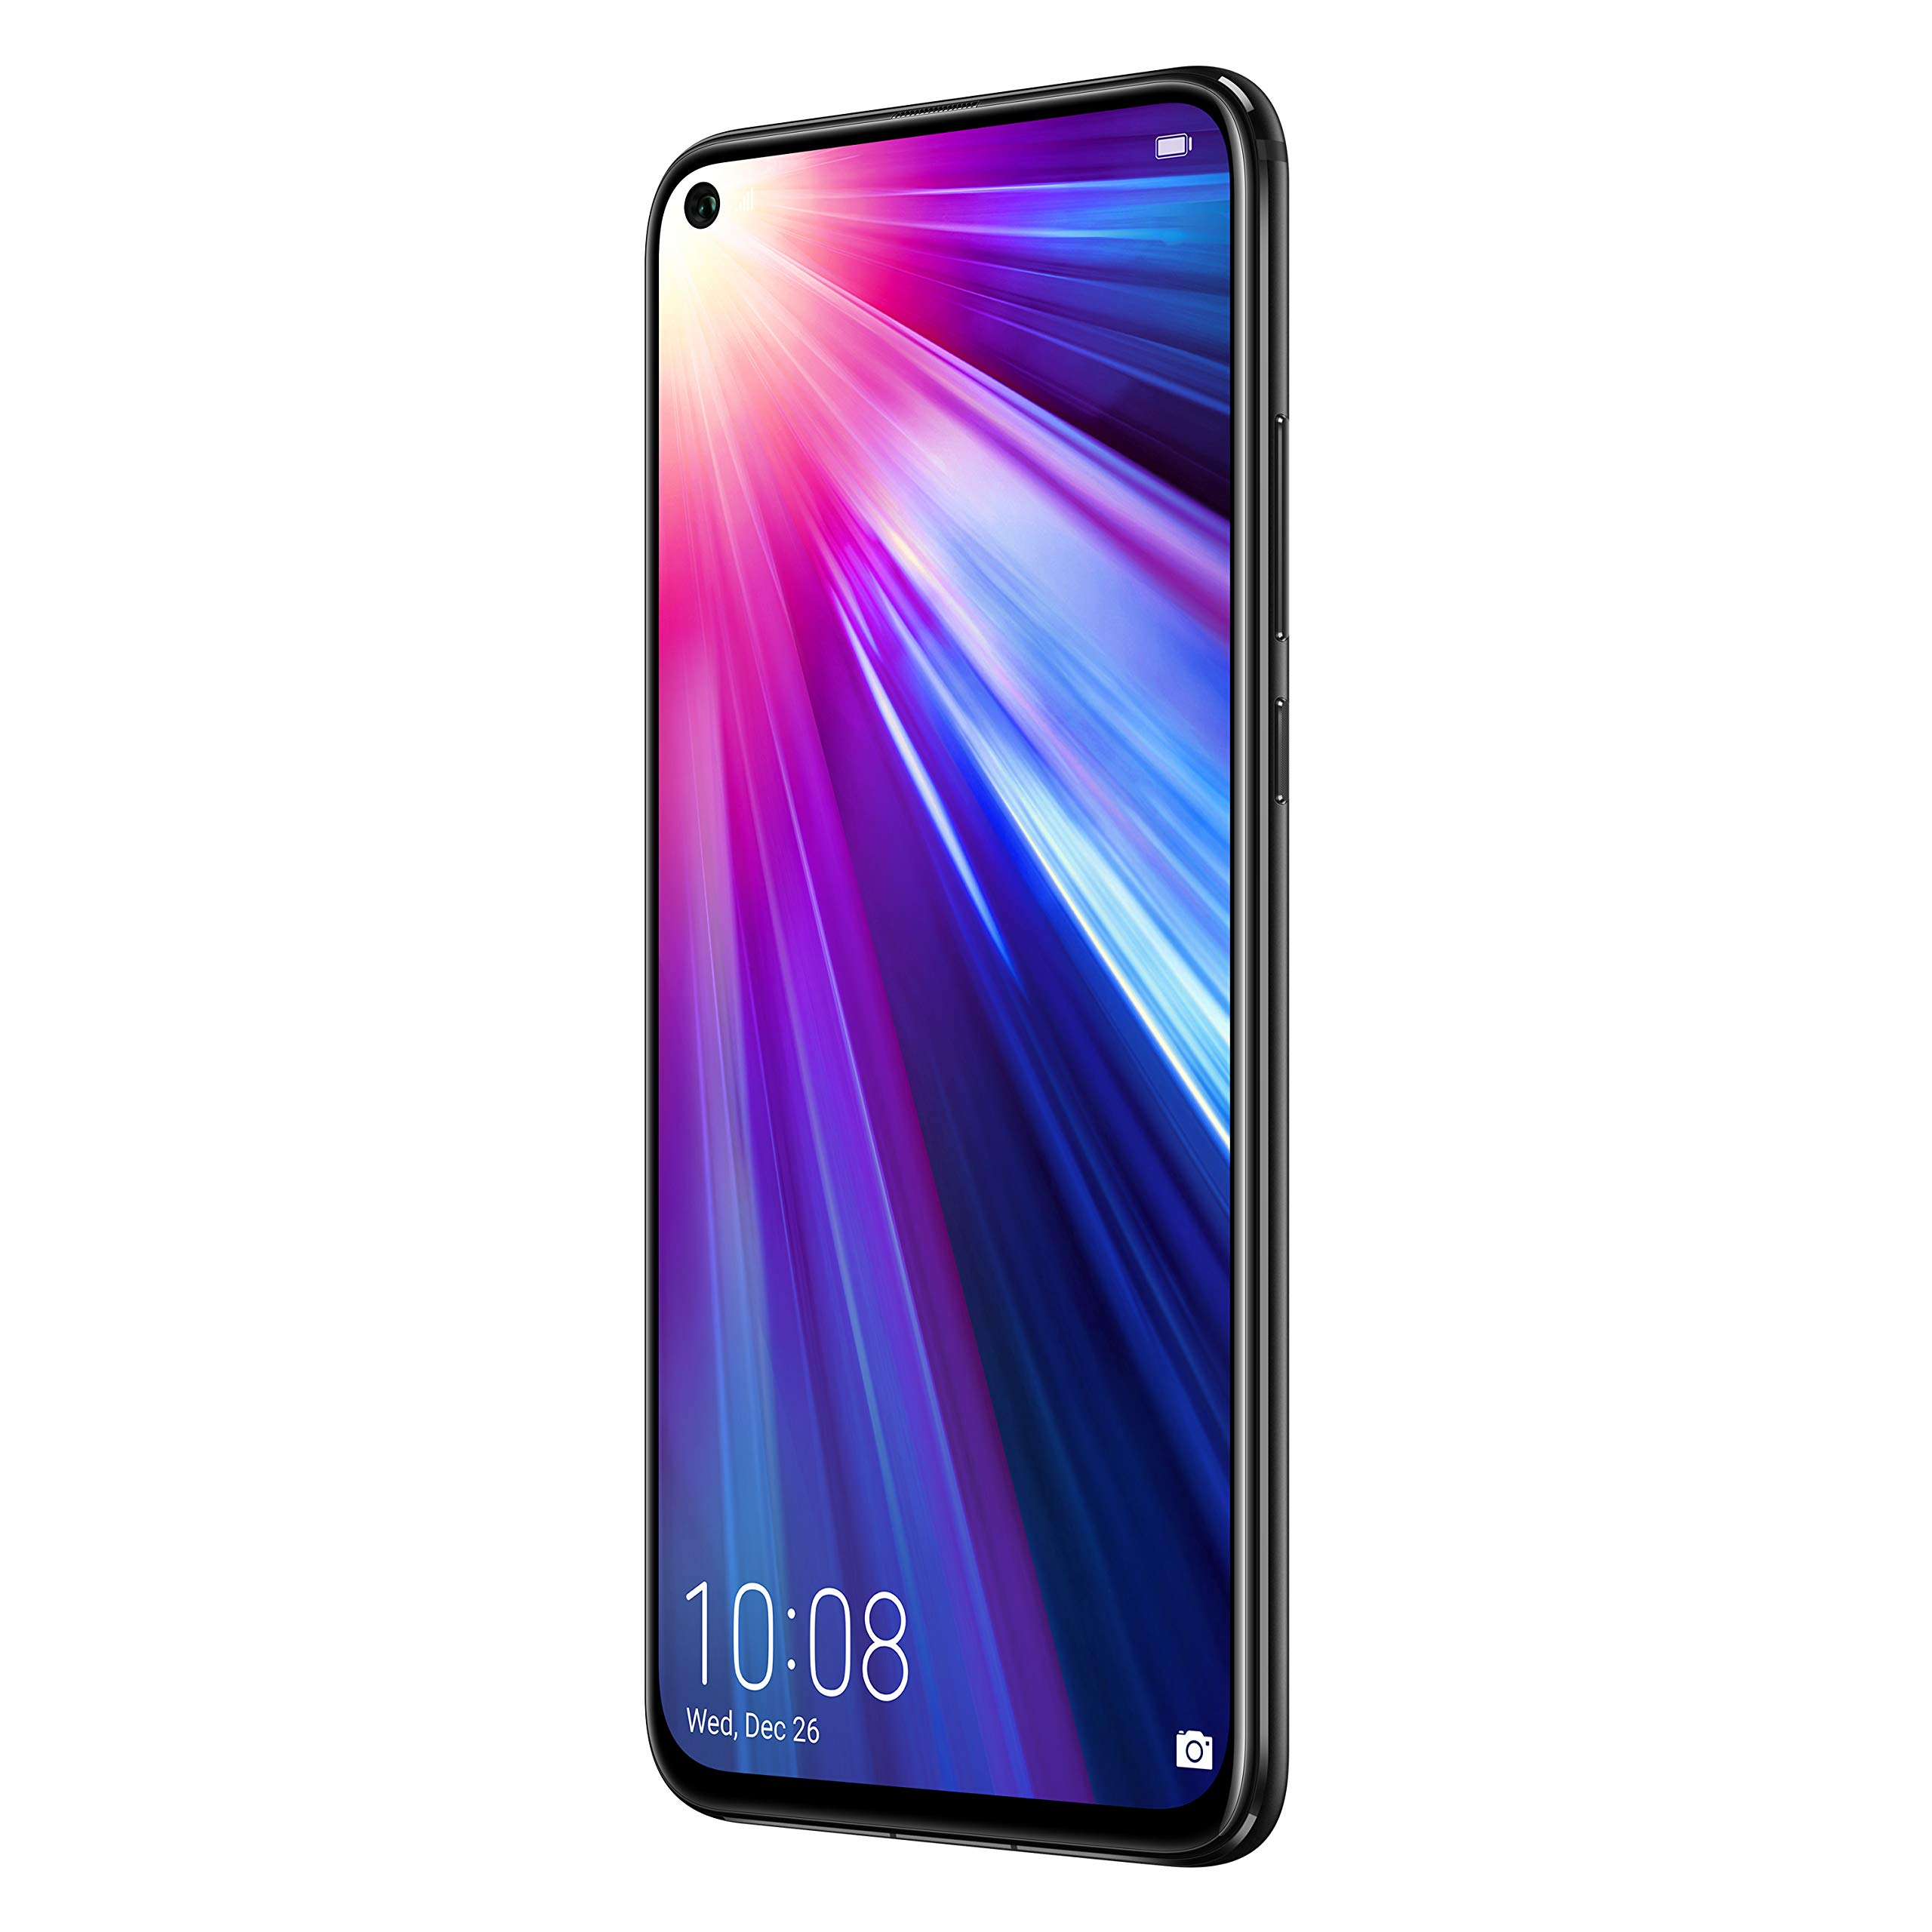 Honor View 20 PCT-L29 Dual SIM (128GB ROM/6GB RAM, GSM solamente, sin CDMA) desbloqueado de fábrica 4G/LTE Smartphone: Amazon.es: Electrónica